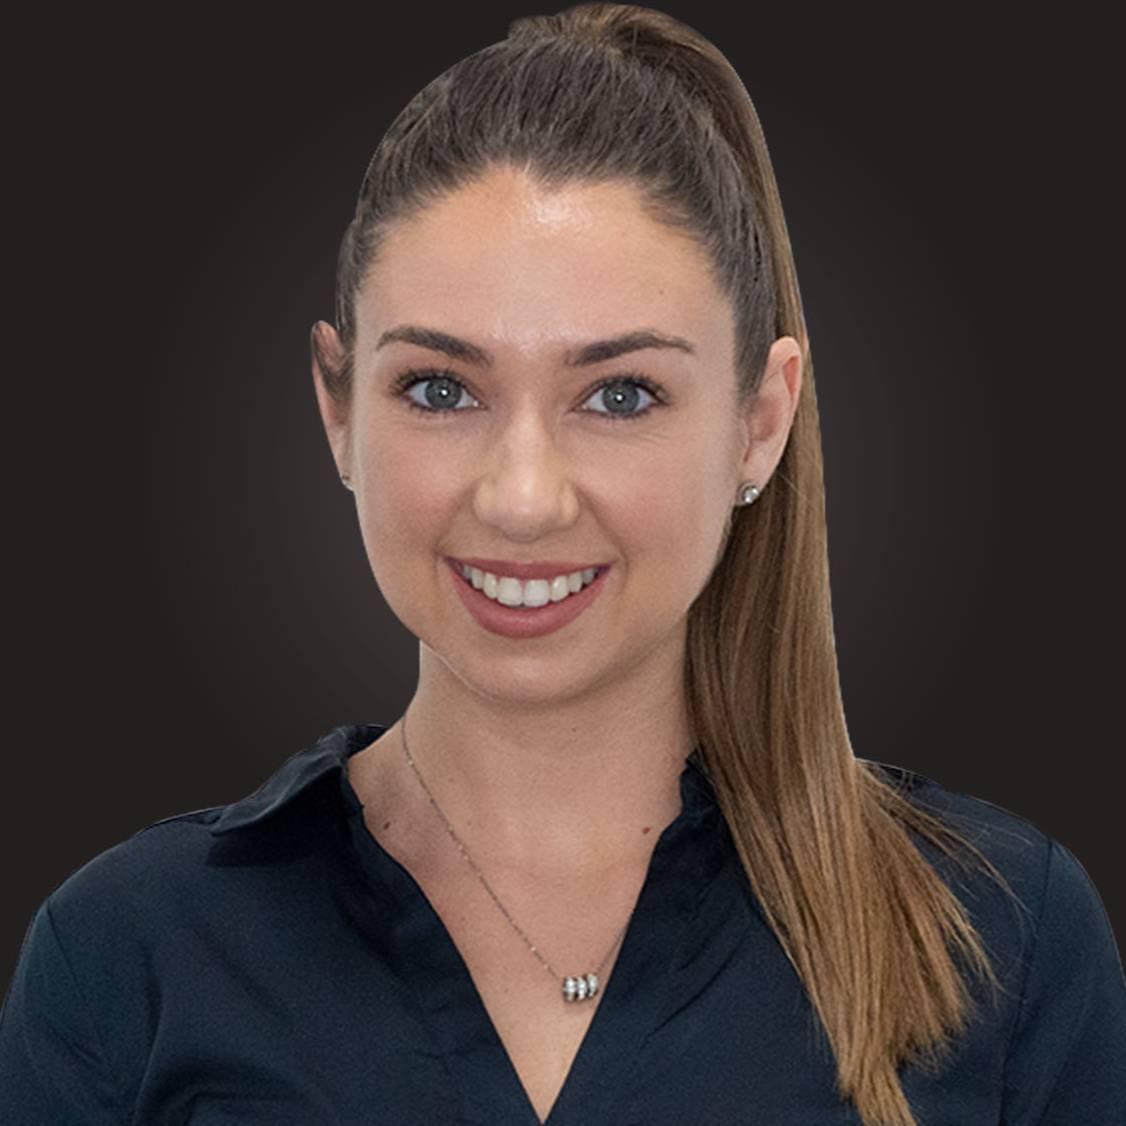 Danielle Broomhead